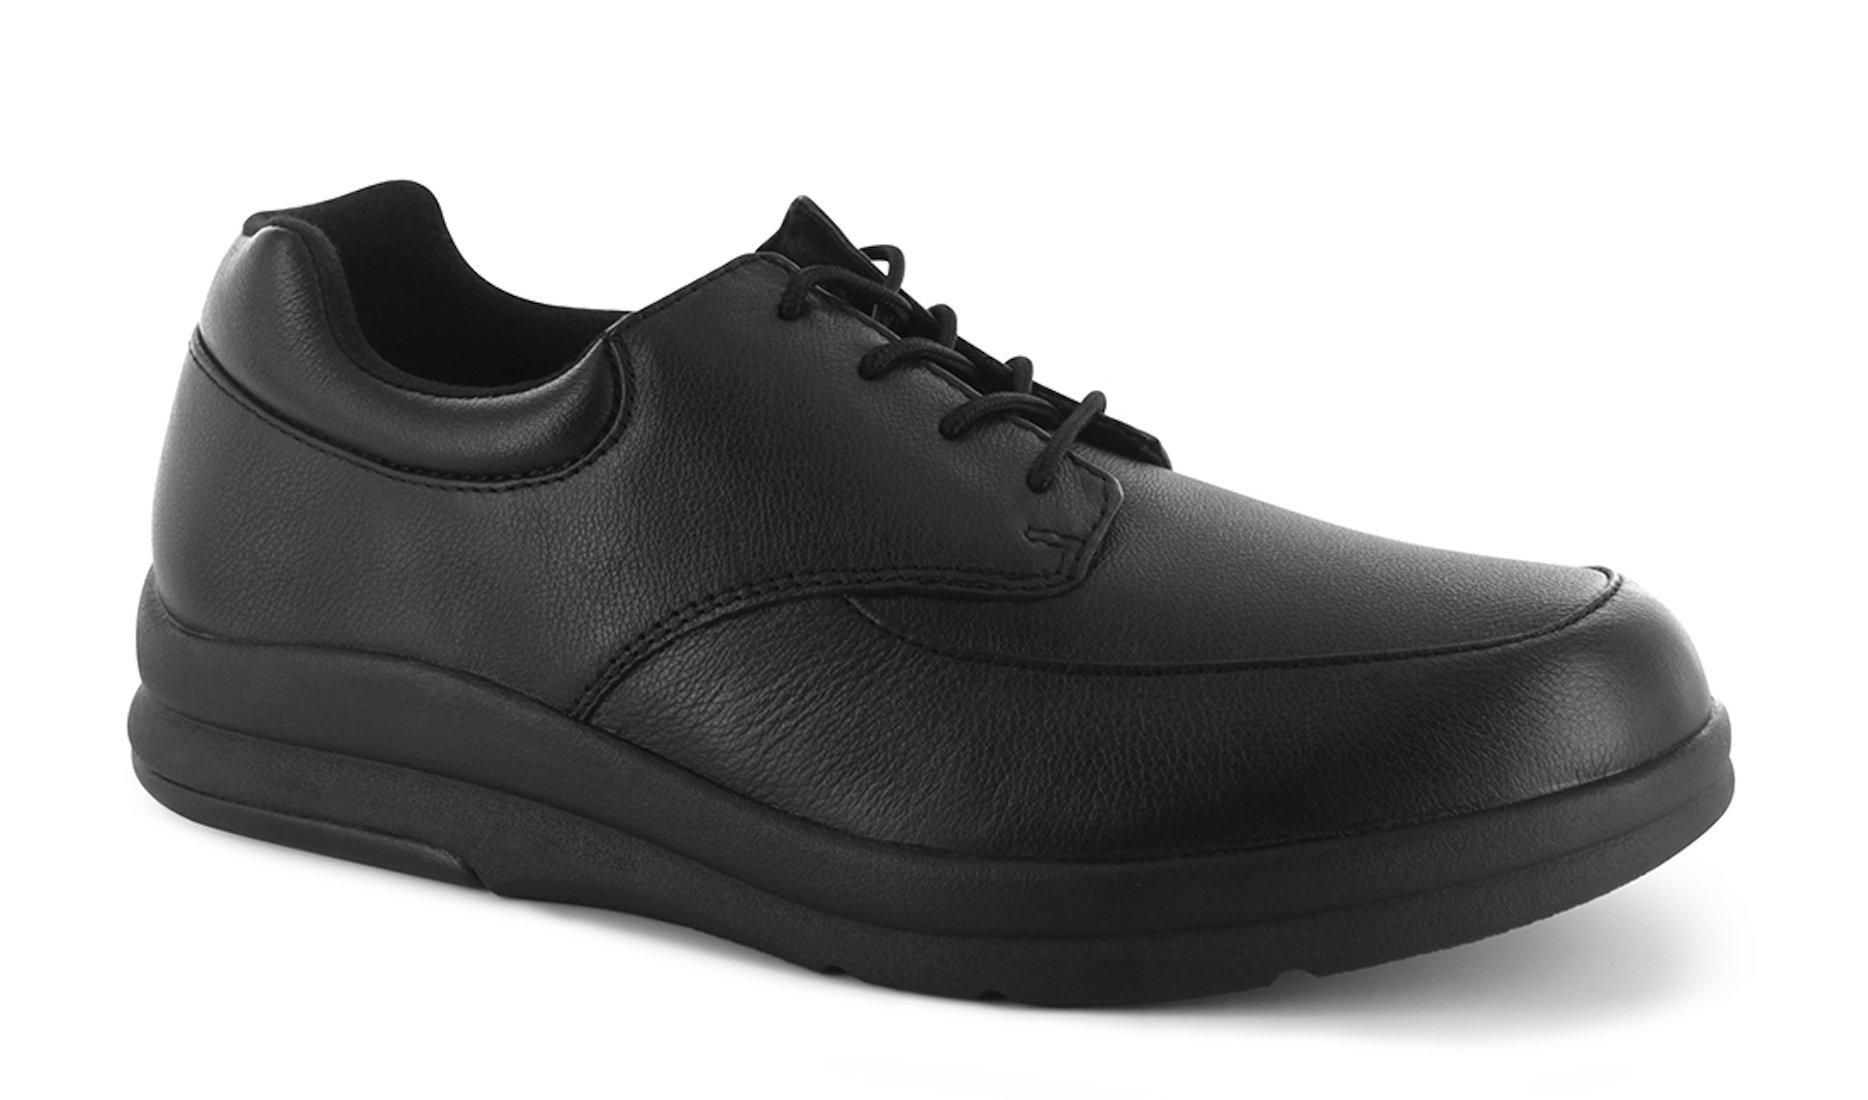 P W Minor Pace Walker Men's Therapeutic Casual Extra Depth Shoe: Black 15 XX-Wide (5E) Lace